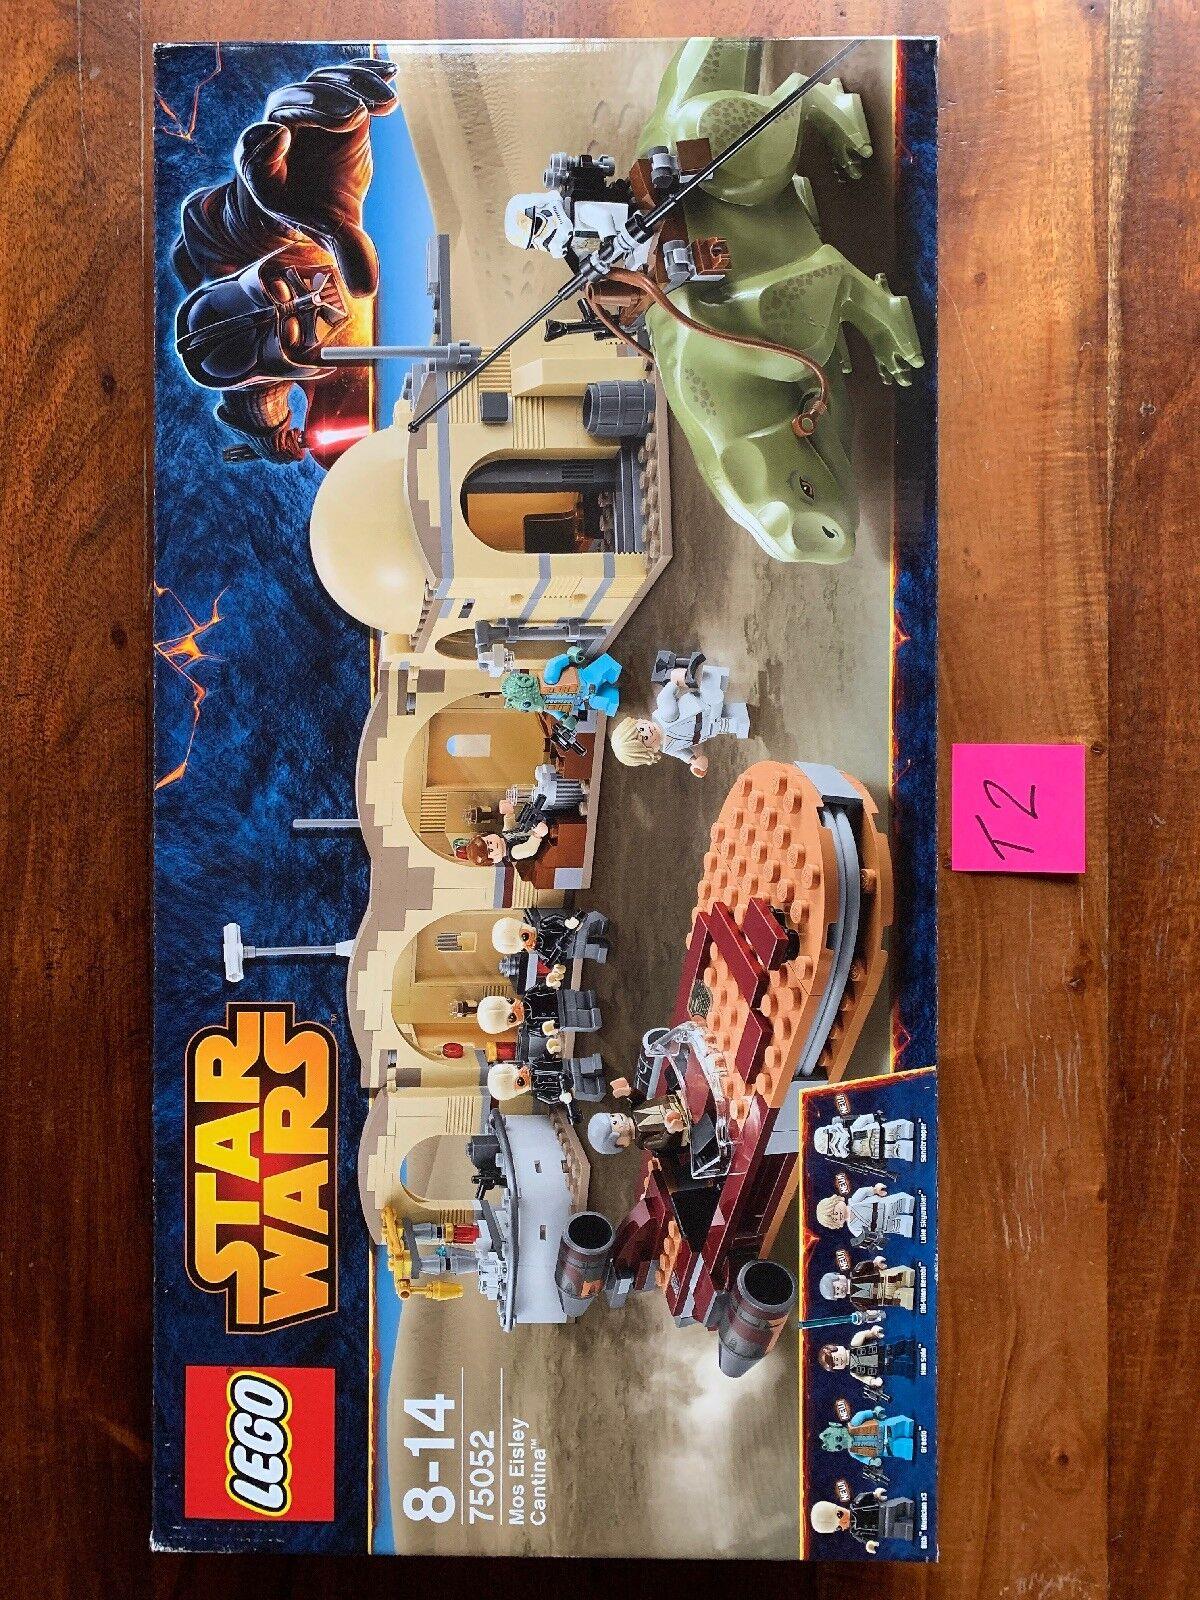 LEGO 75052 Star Wars Mos Eisley Cantina - Retired 2014 BNISB Factory sealed - T2